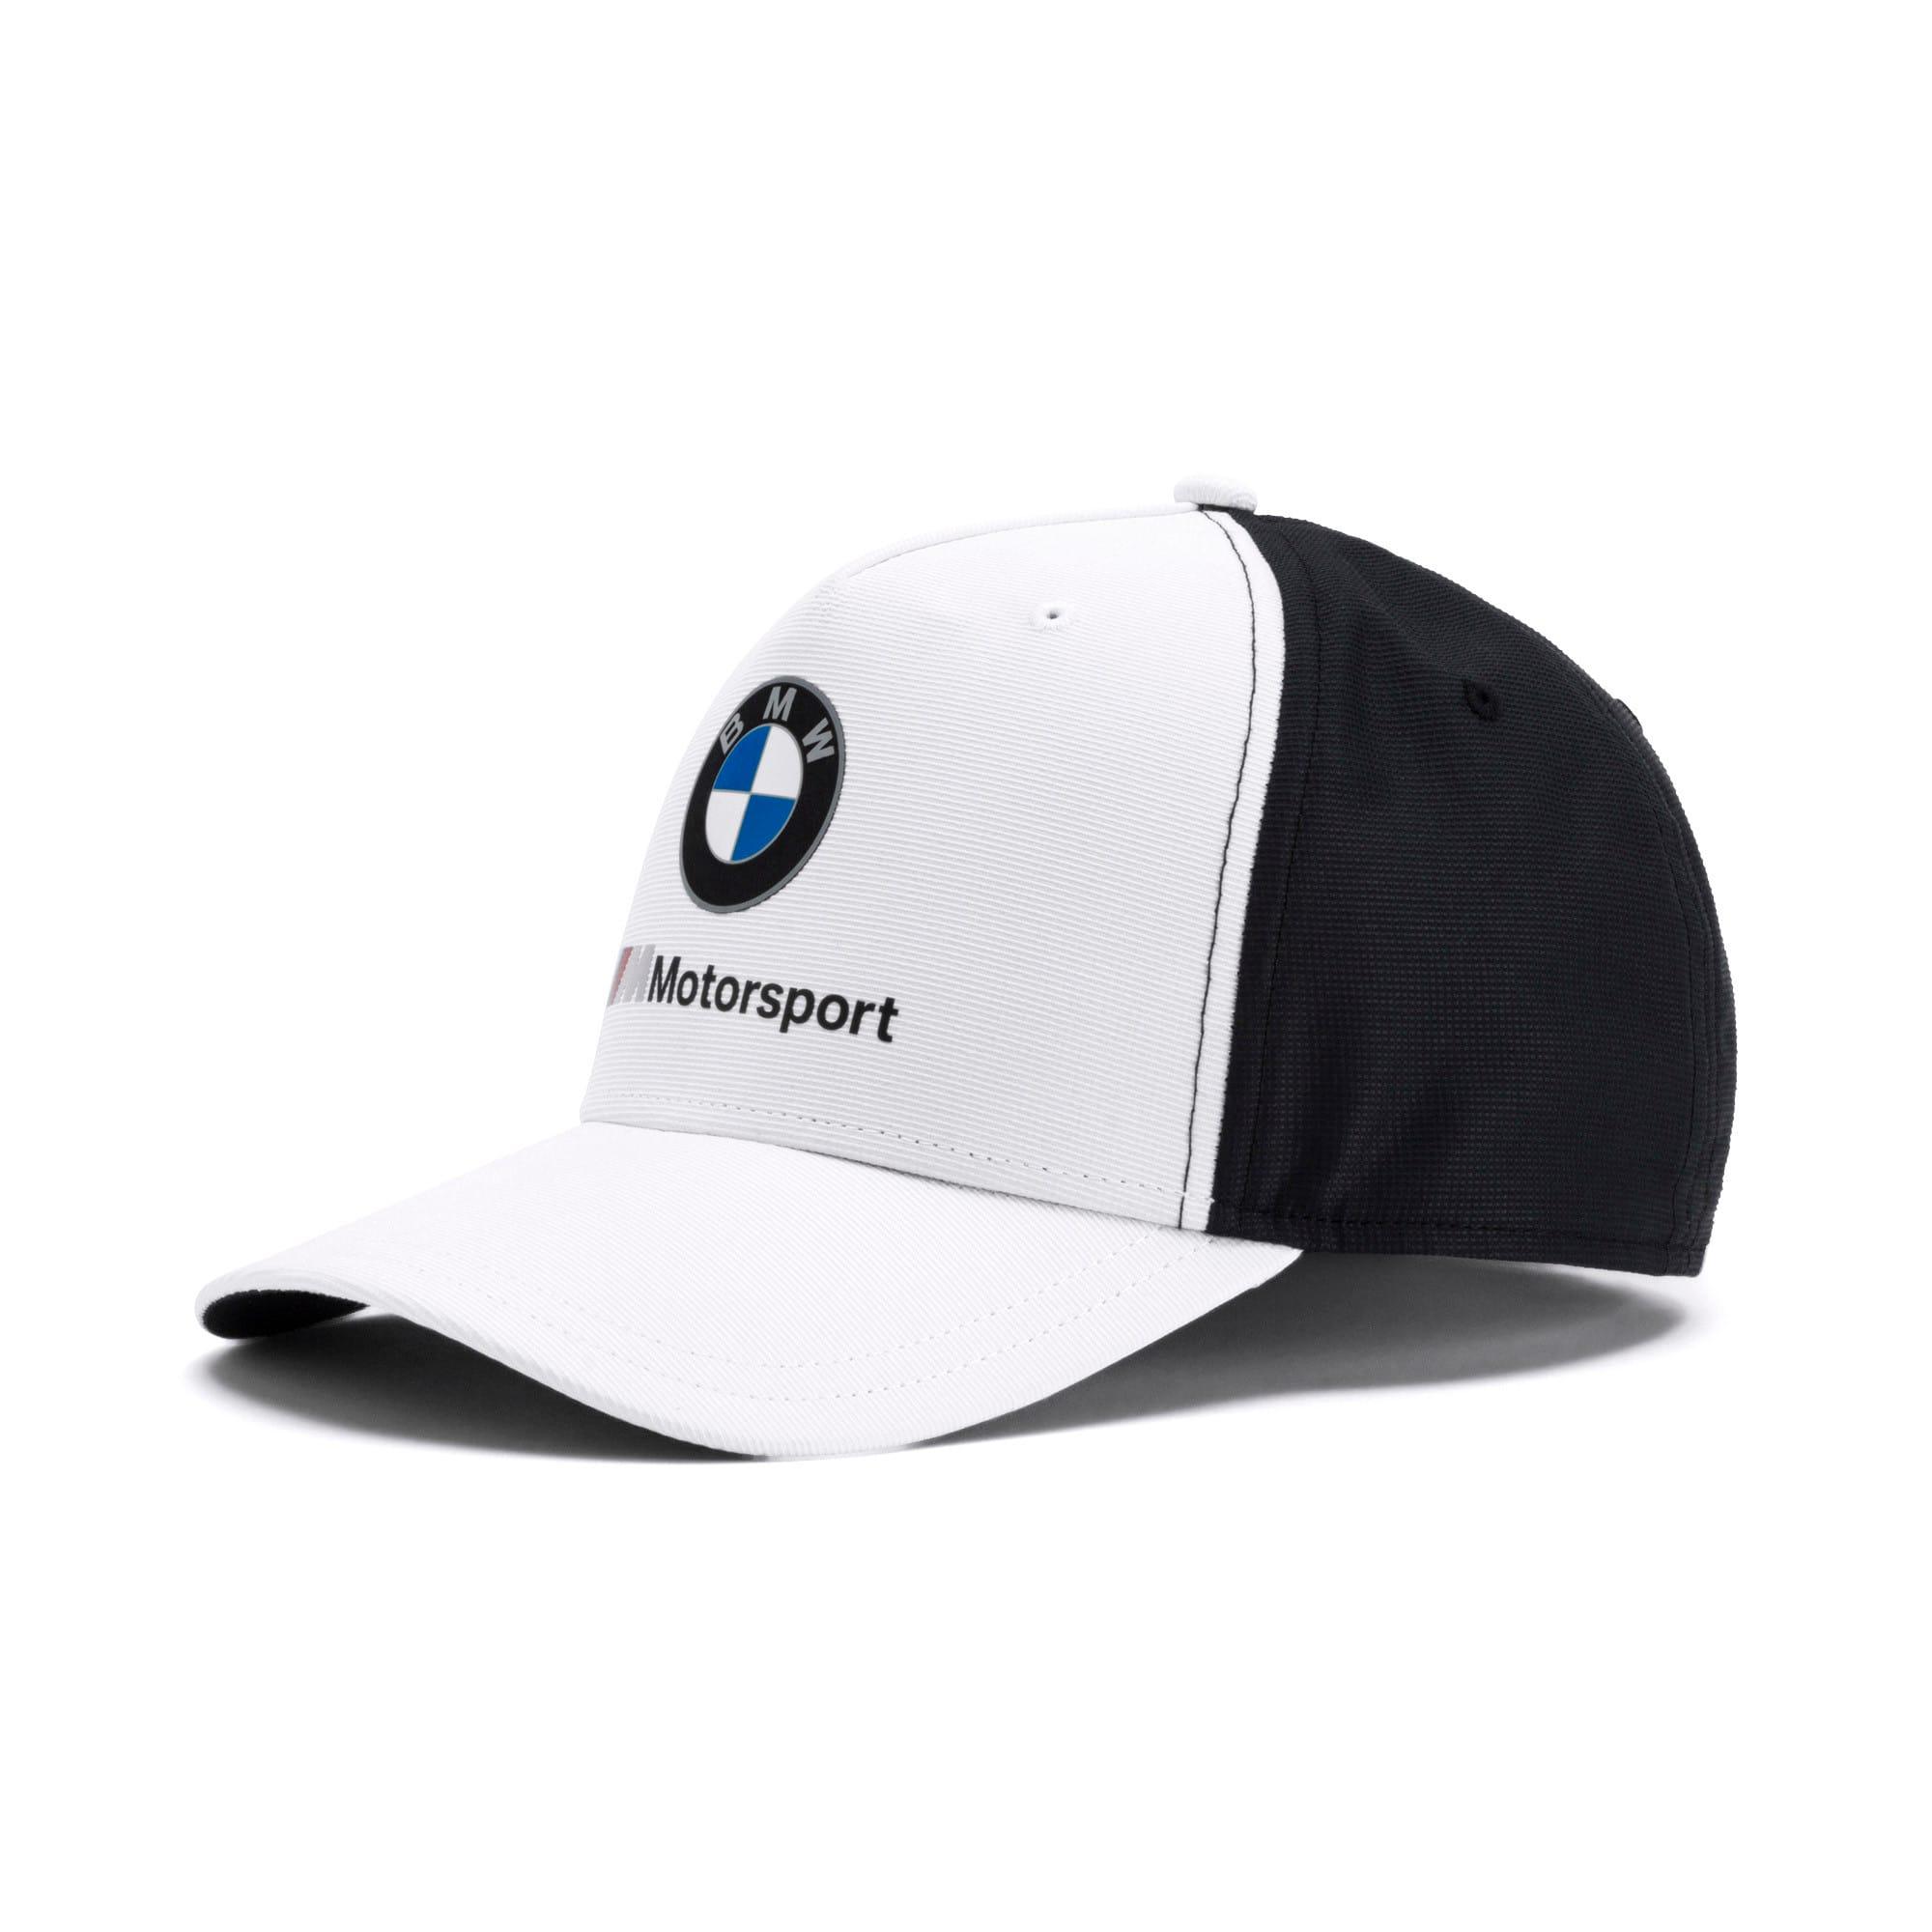 Thumbnail 1 of BMW Motorsport Cap, Puma White, medium